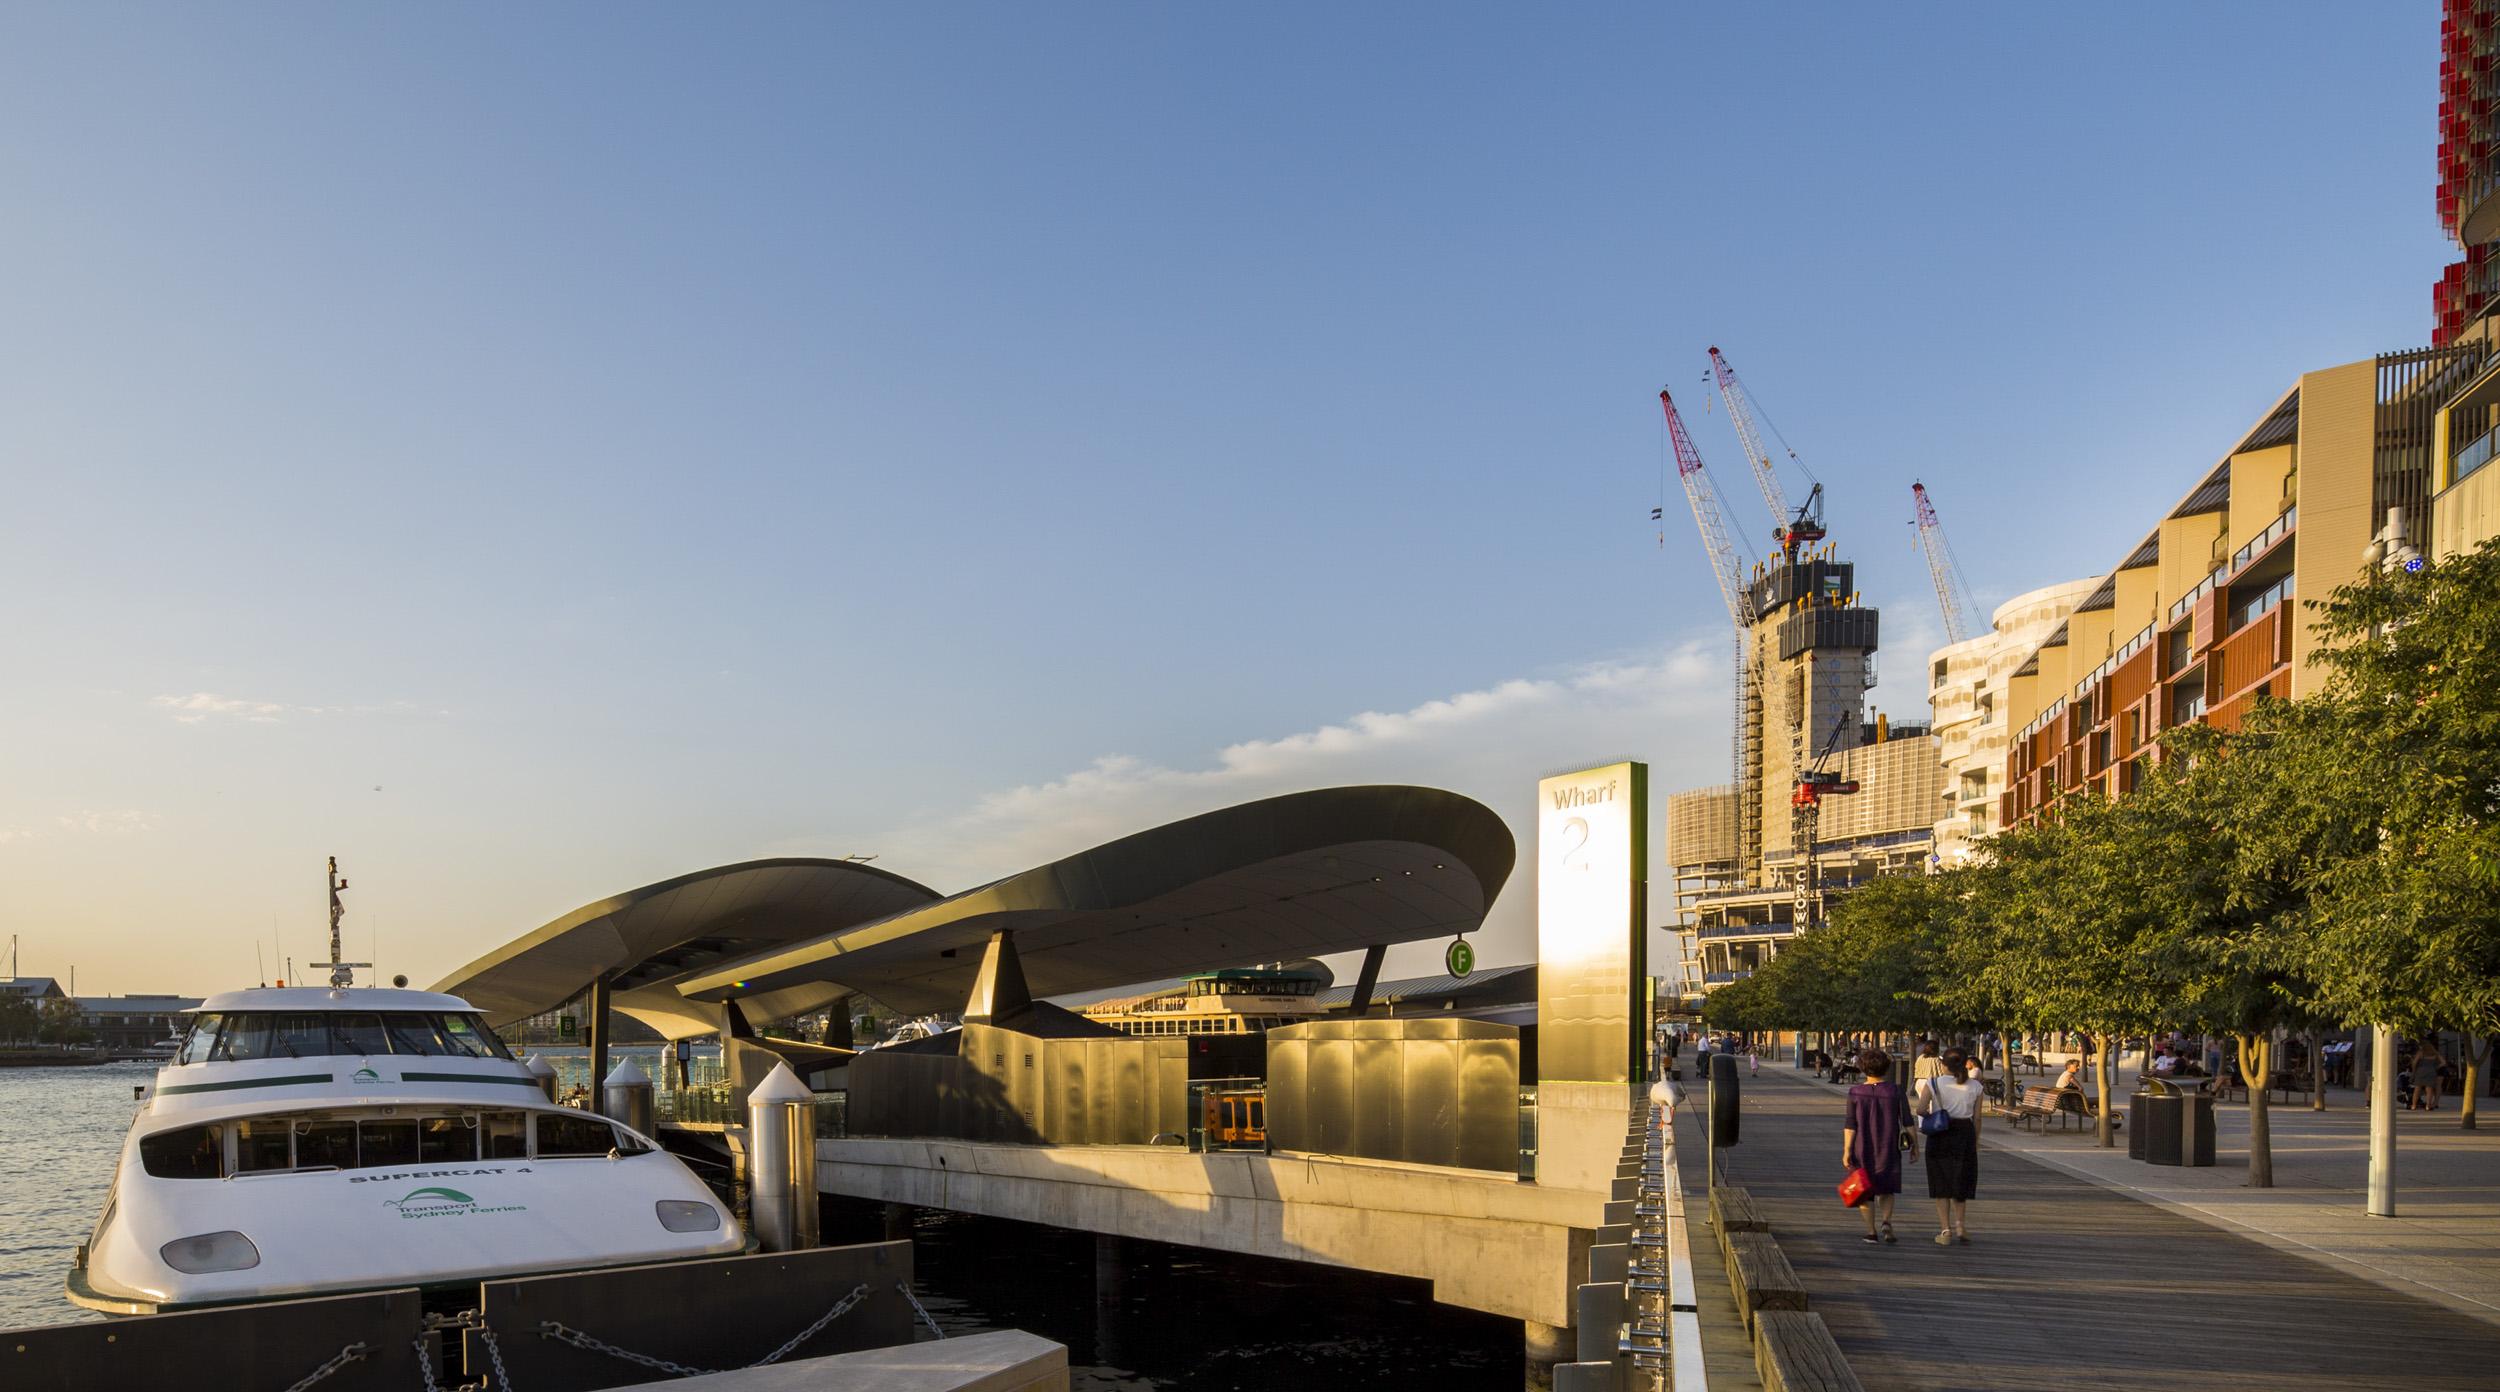 Barangaroo_wharf_cox_architecture_sydney_08.jpg